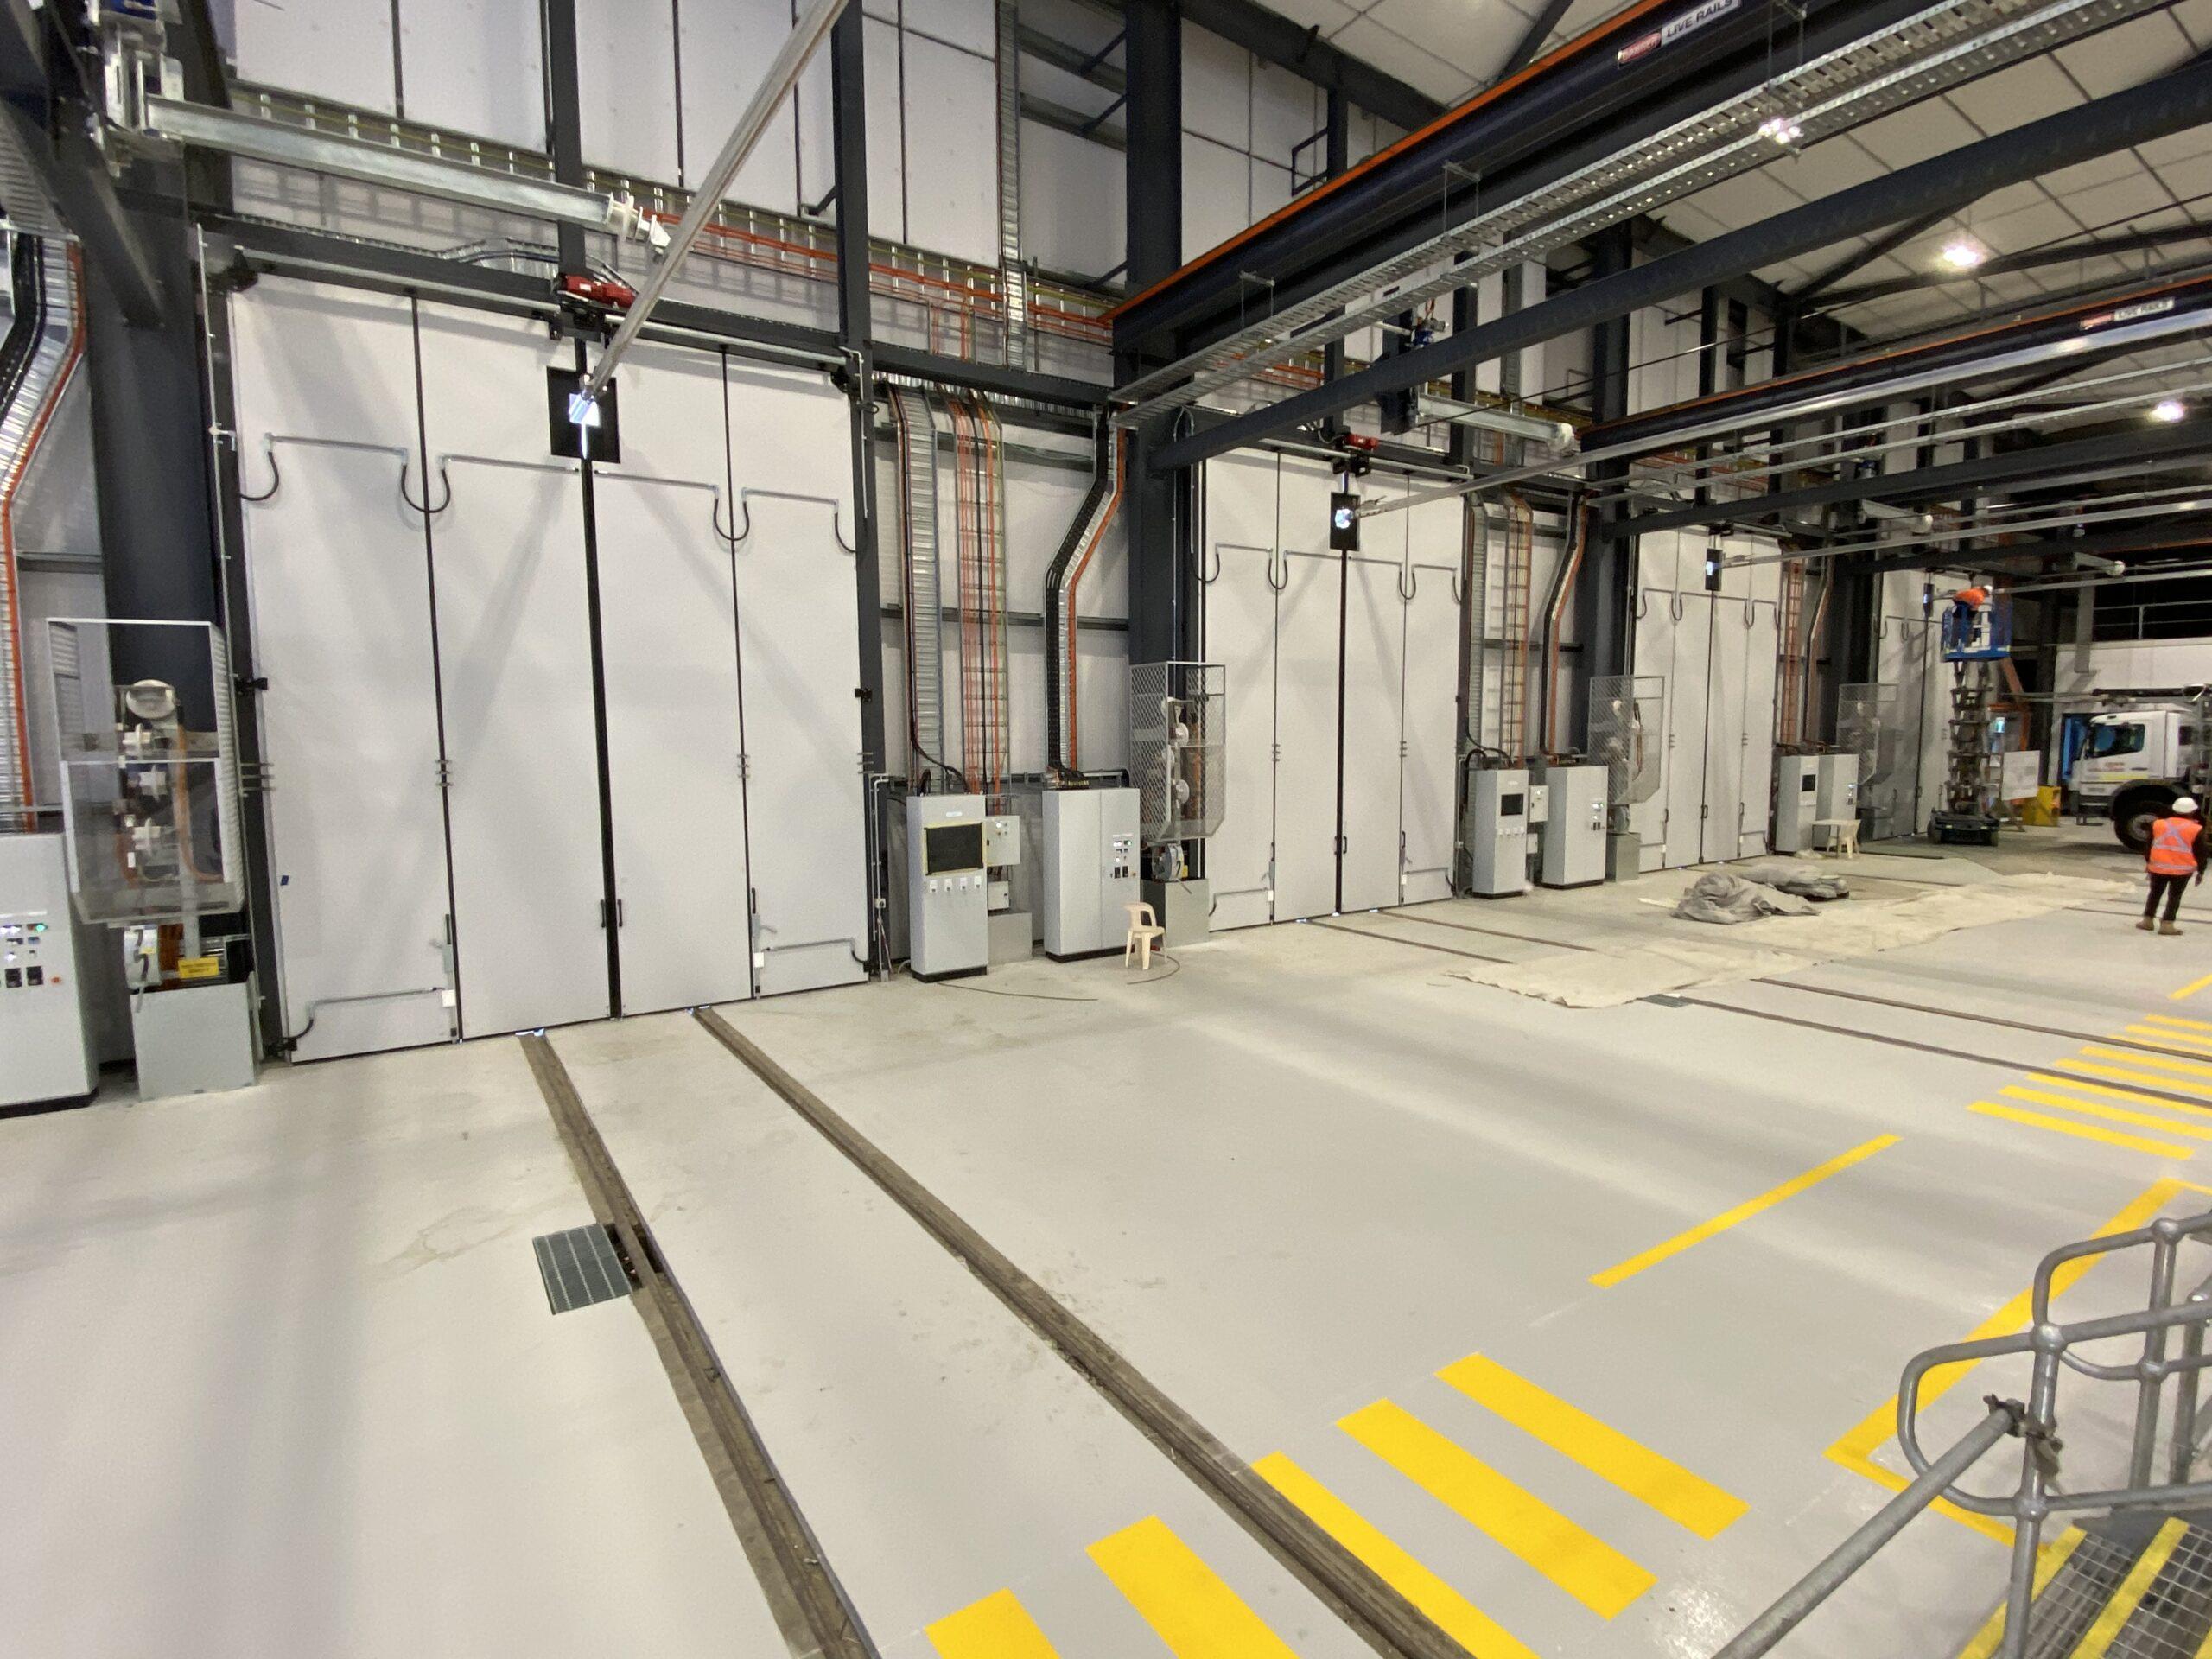 New Intercity Fleet Maintenance Facility in Kangy Angy, NSW